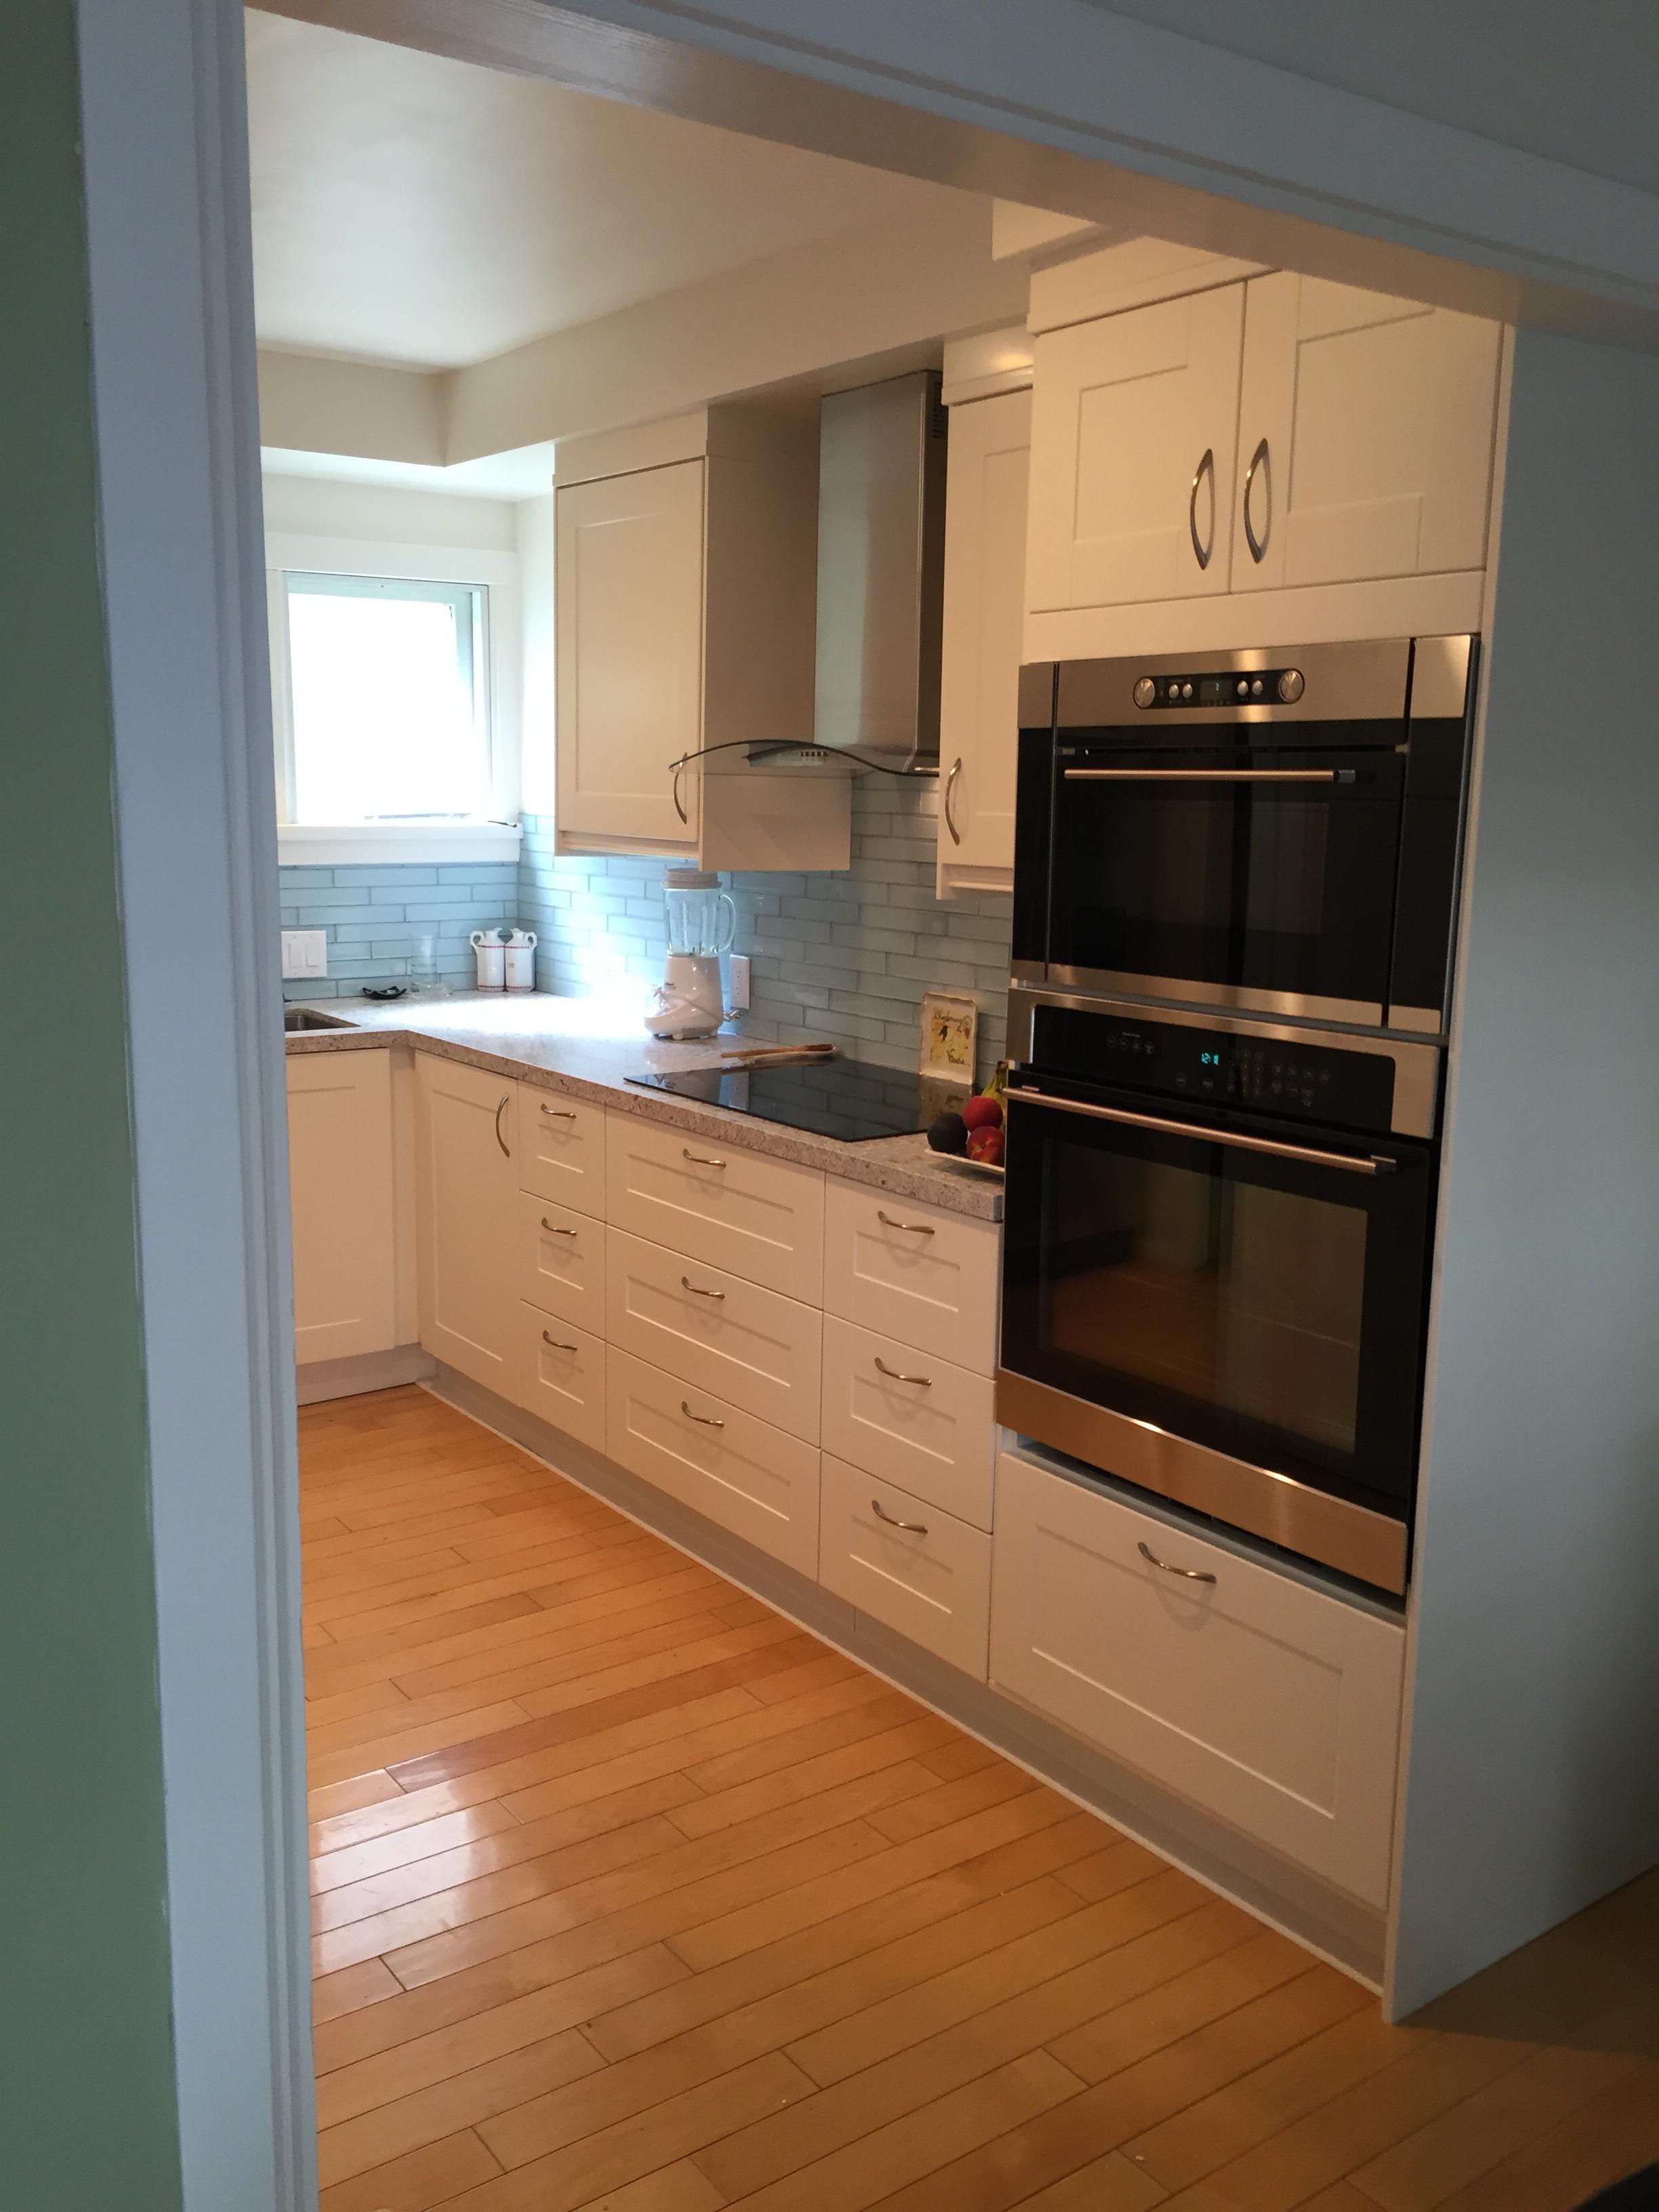 ikea oven microwave combo binnenhof construction kitchen installations. Black Bedroom Furniture Sets. Home Design Ideas